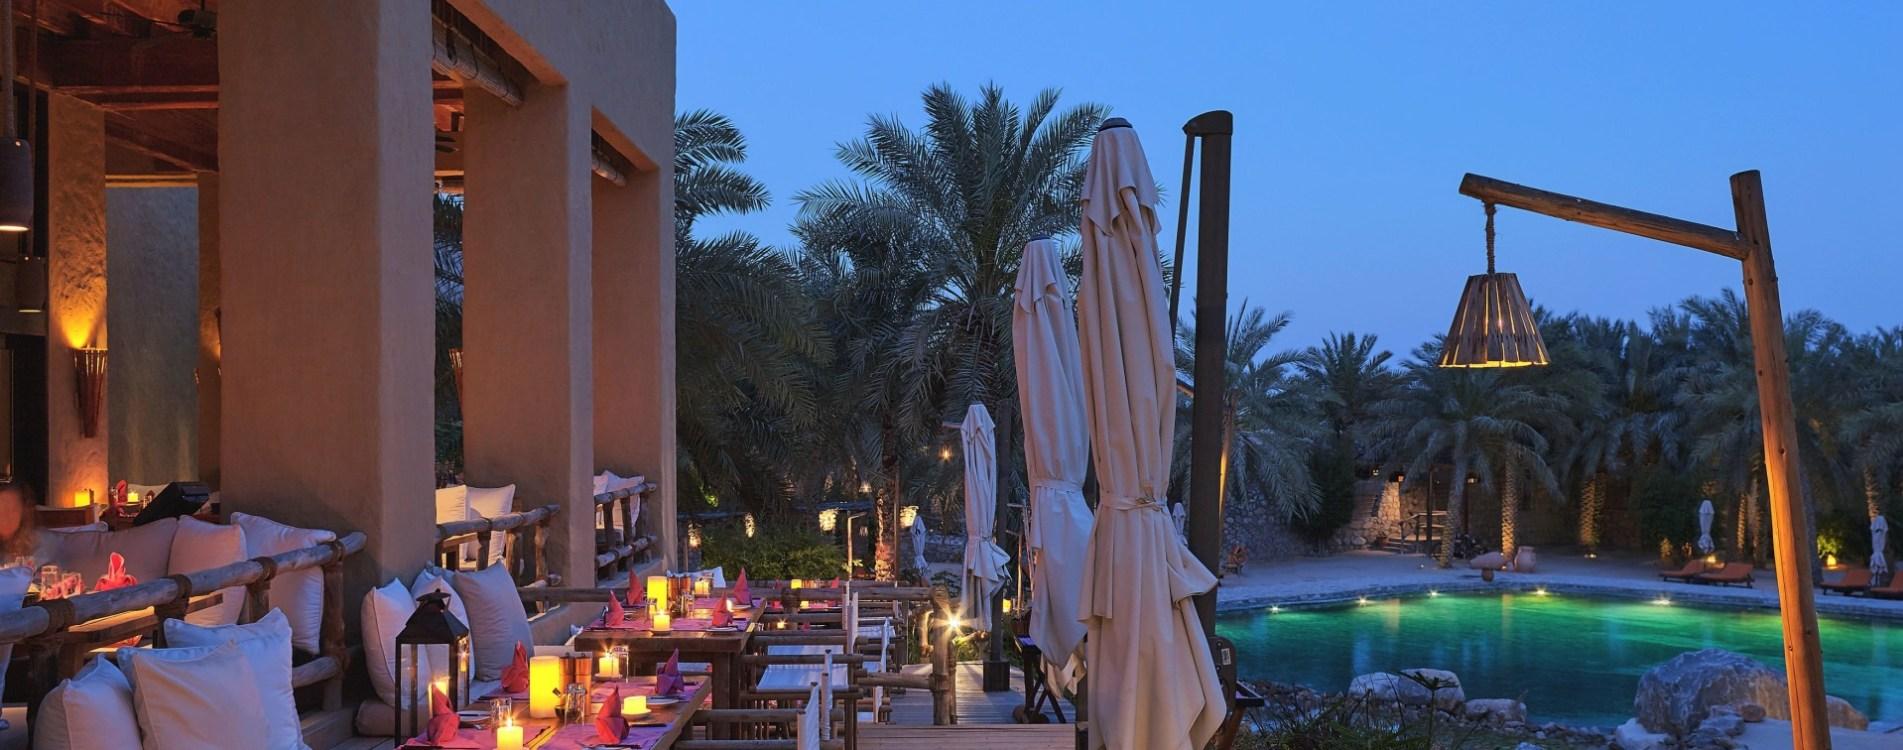 Six-Senses-Zighy-Bay-Summer-House-Exterior-Restaurant-Oman.jpg